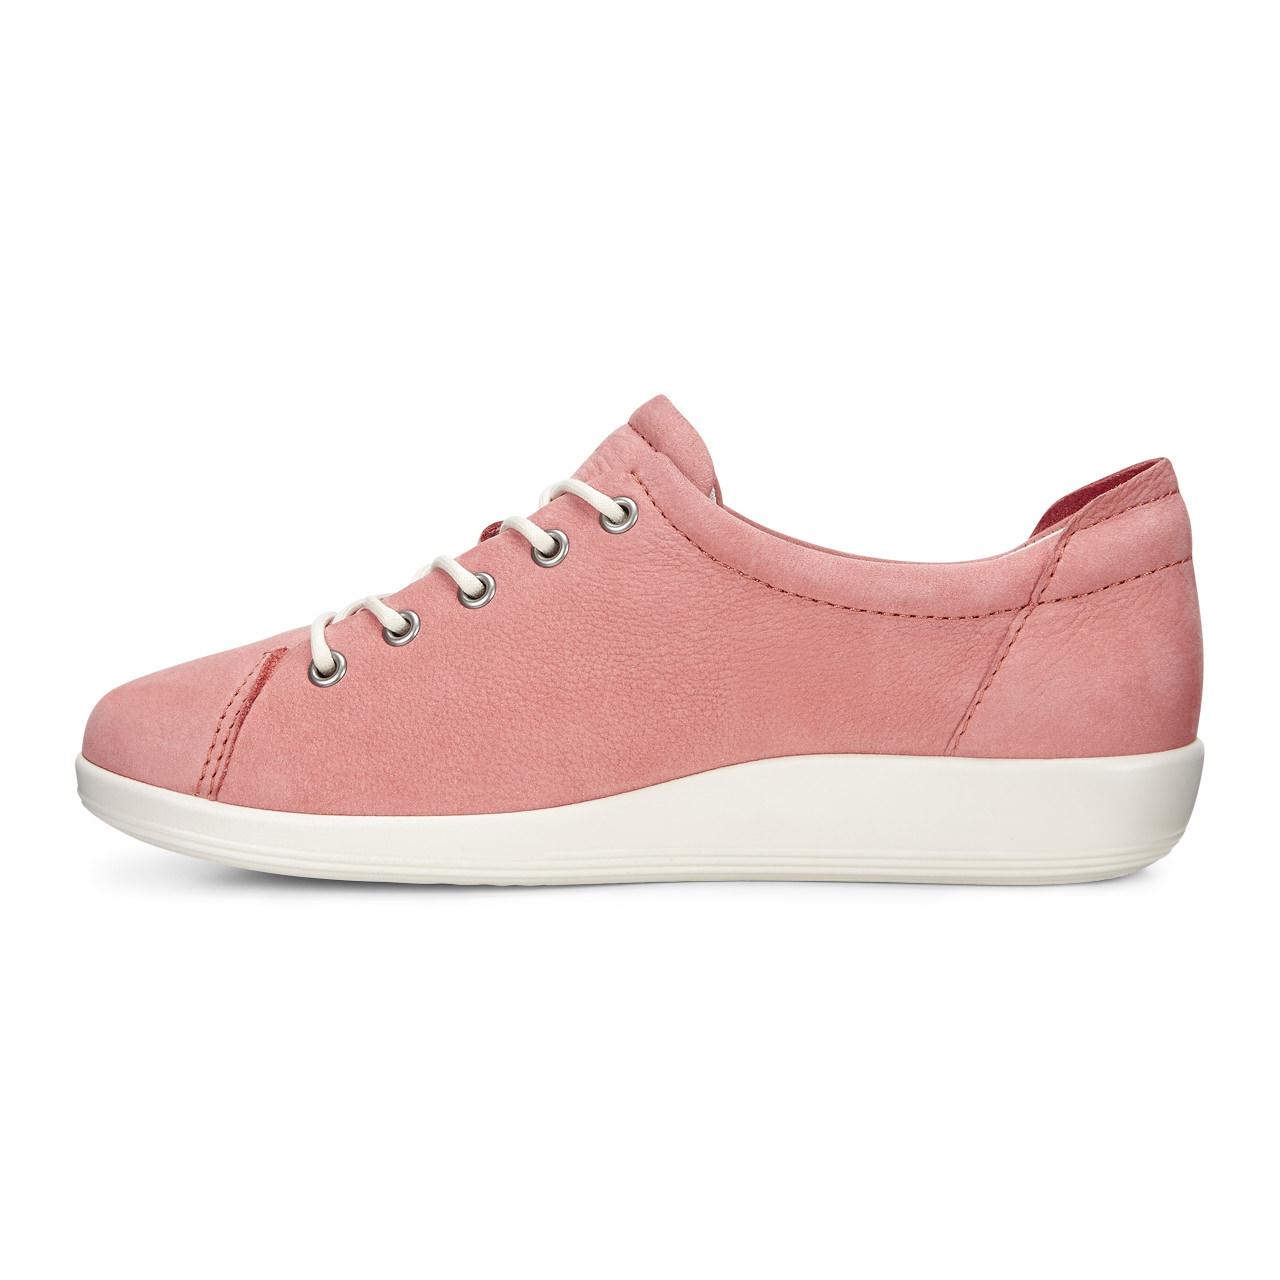 Rosa  5007 Grün BK Sneaker Schuh Creme Weiß